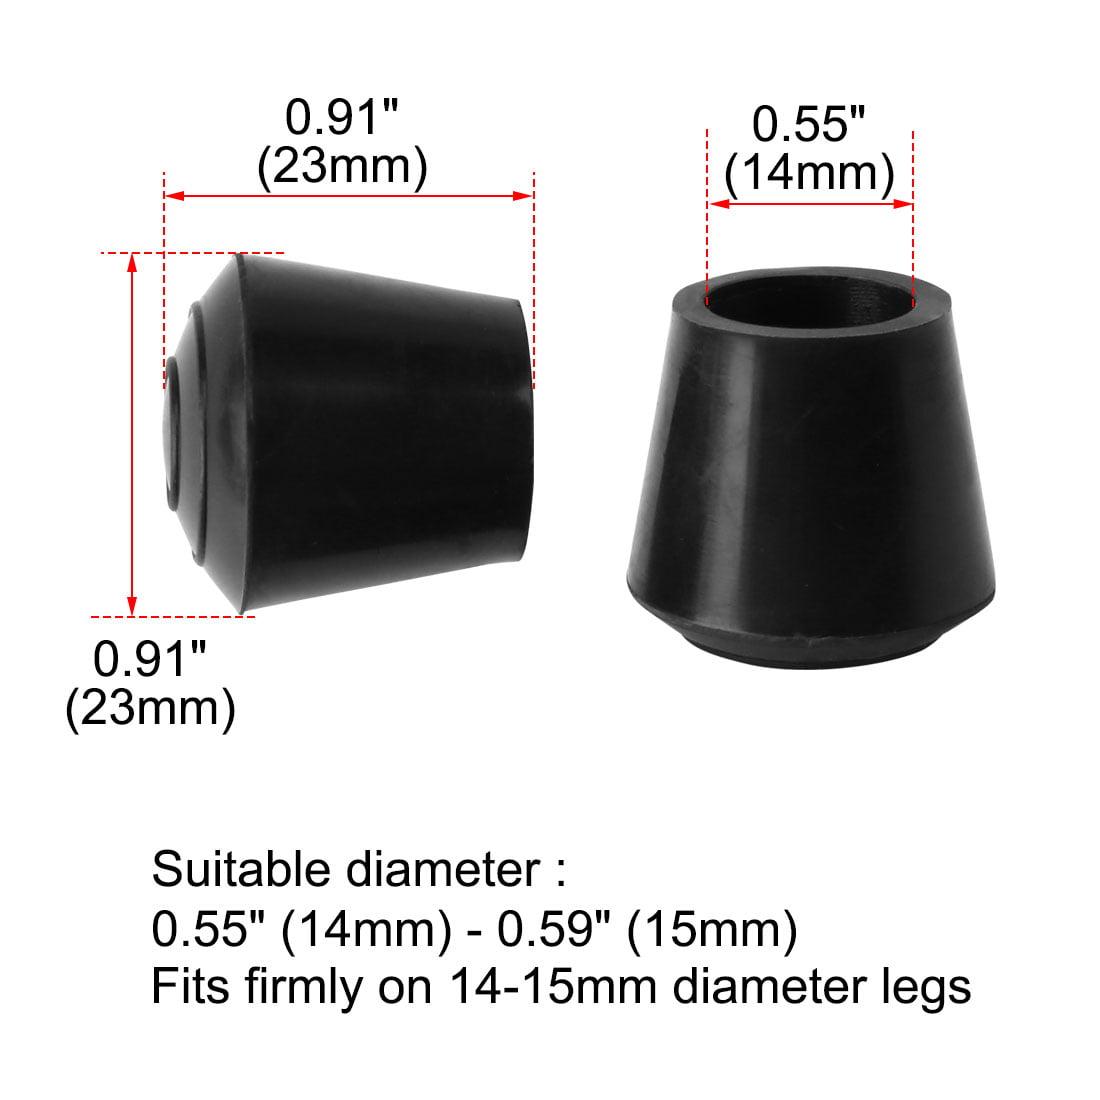 "Rubber Leg Cap Tip Cup Feet Cover 14mm 9/16"" Inner Dia 40pcs for Furniture Table - image 5 de 7"